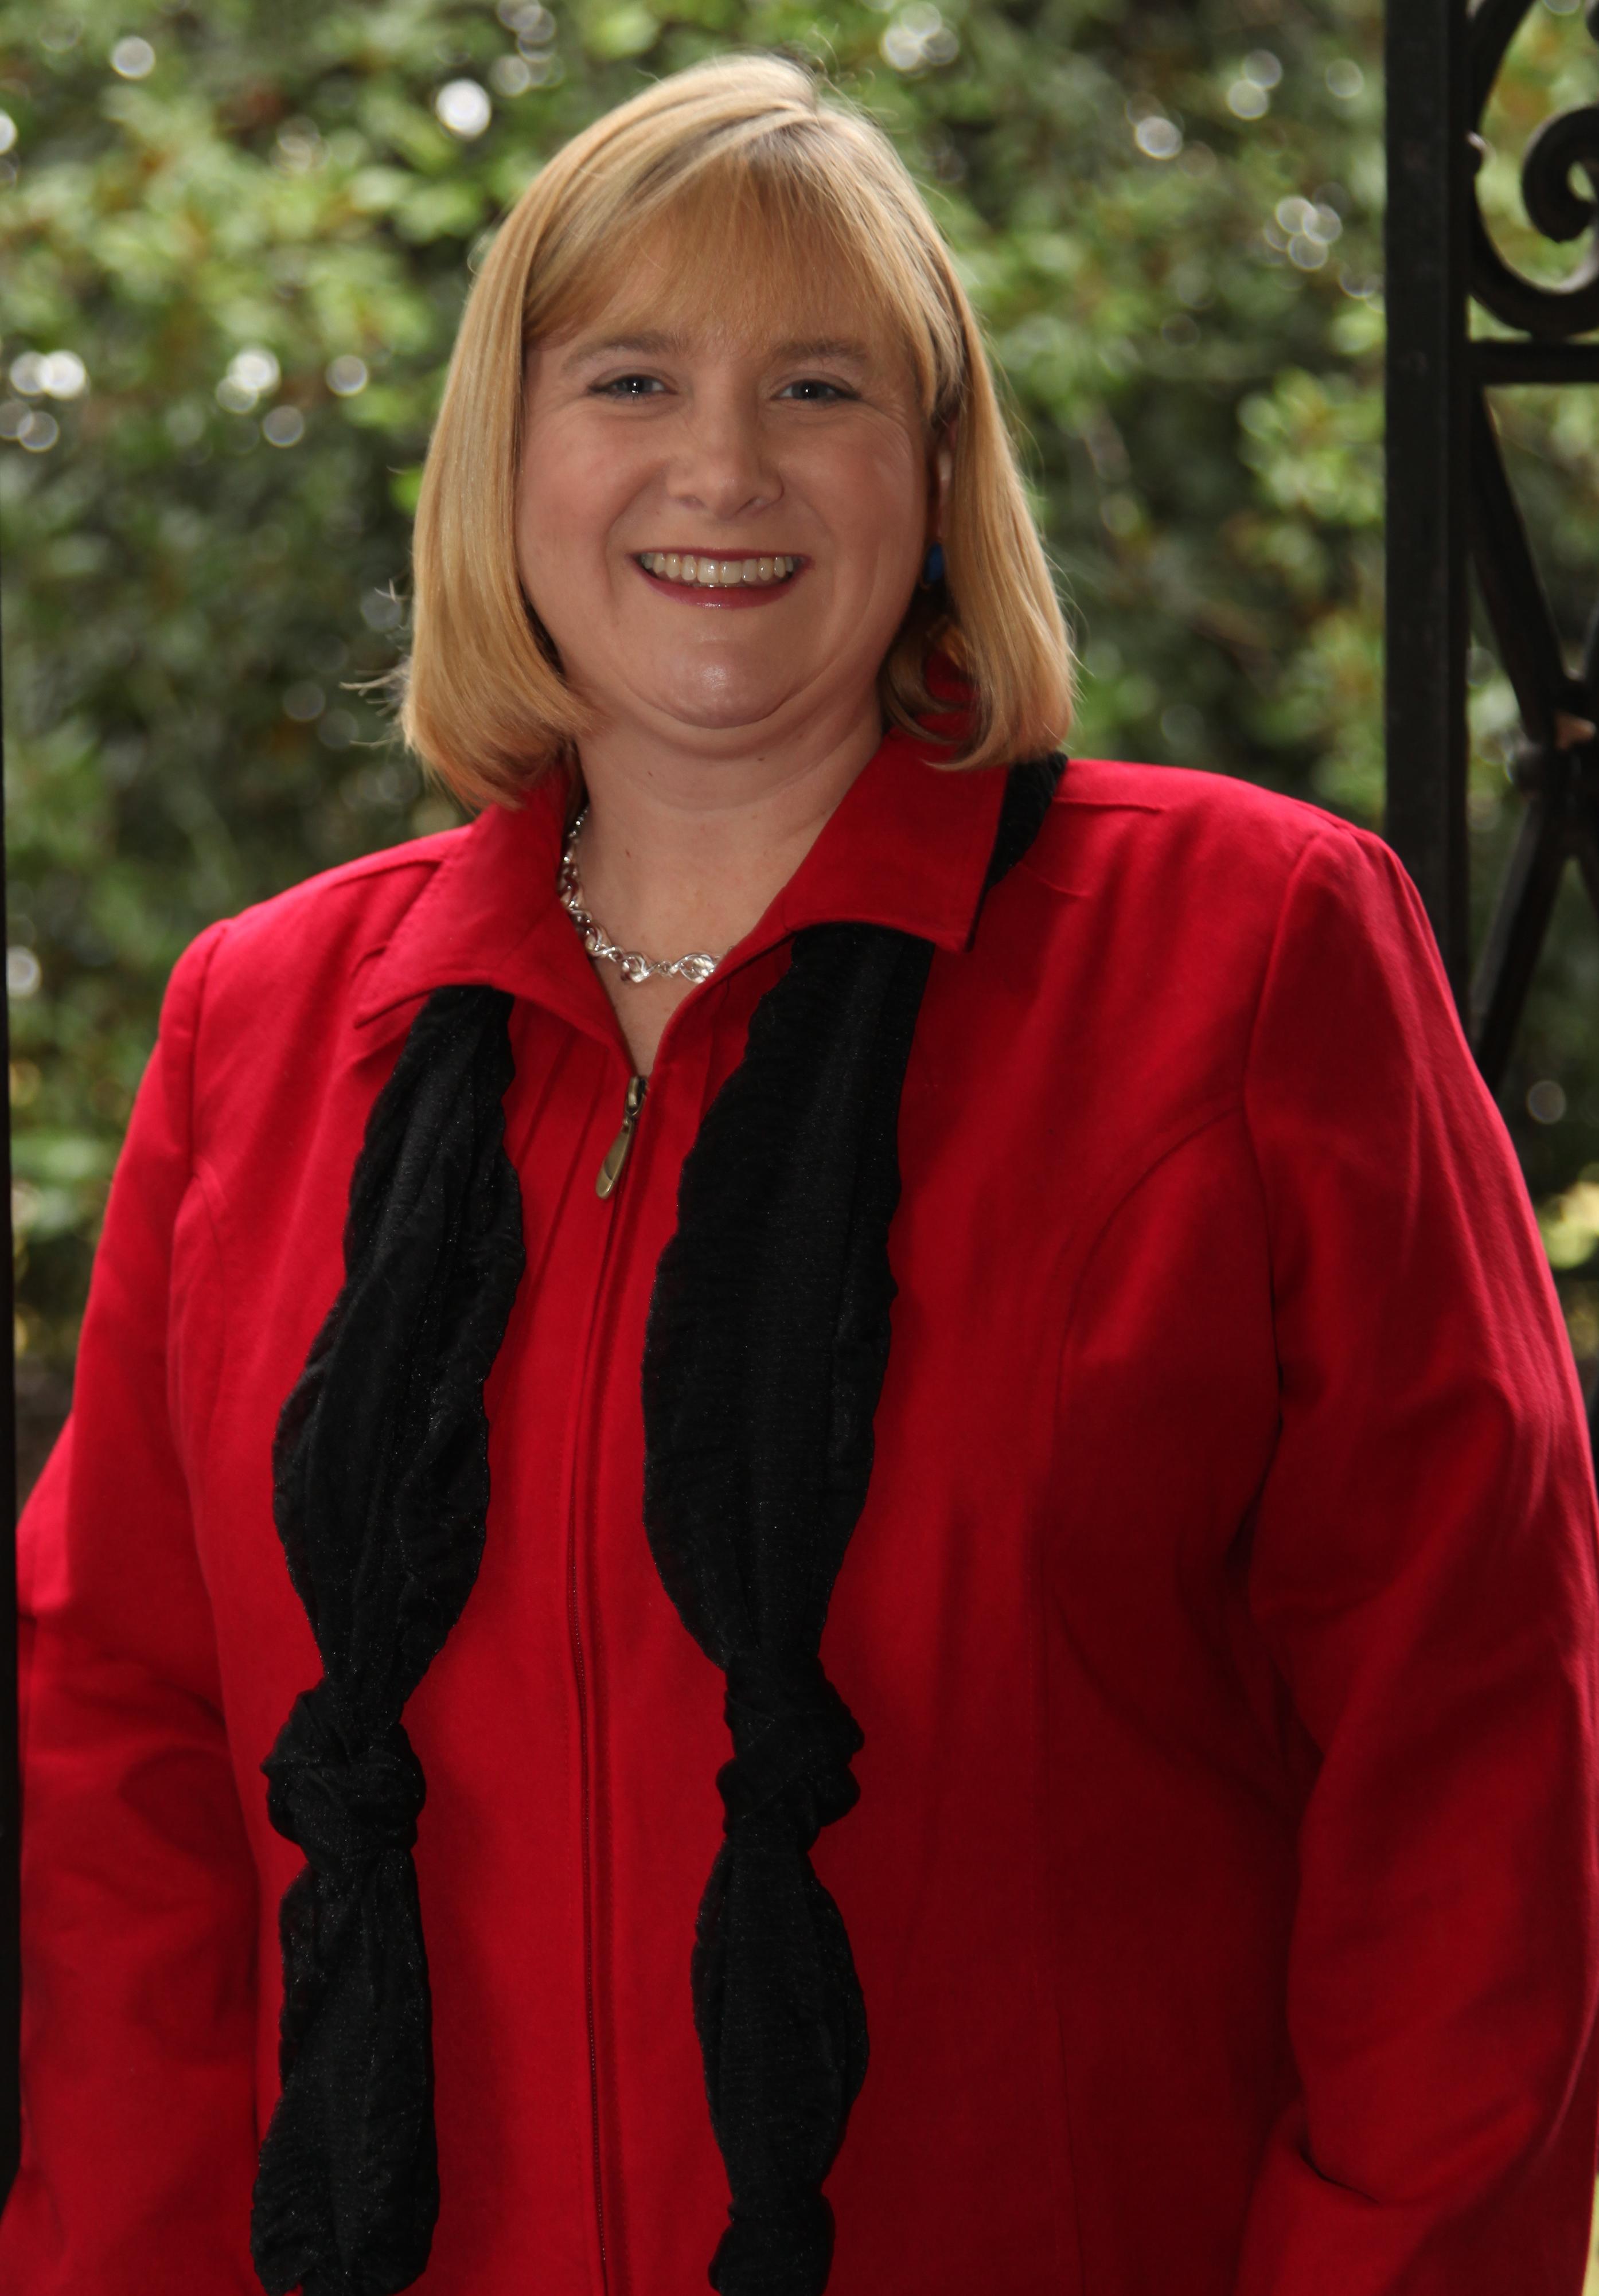 Lori Purcell Bledsoe